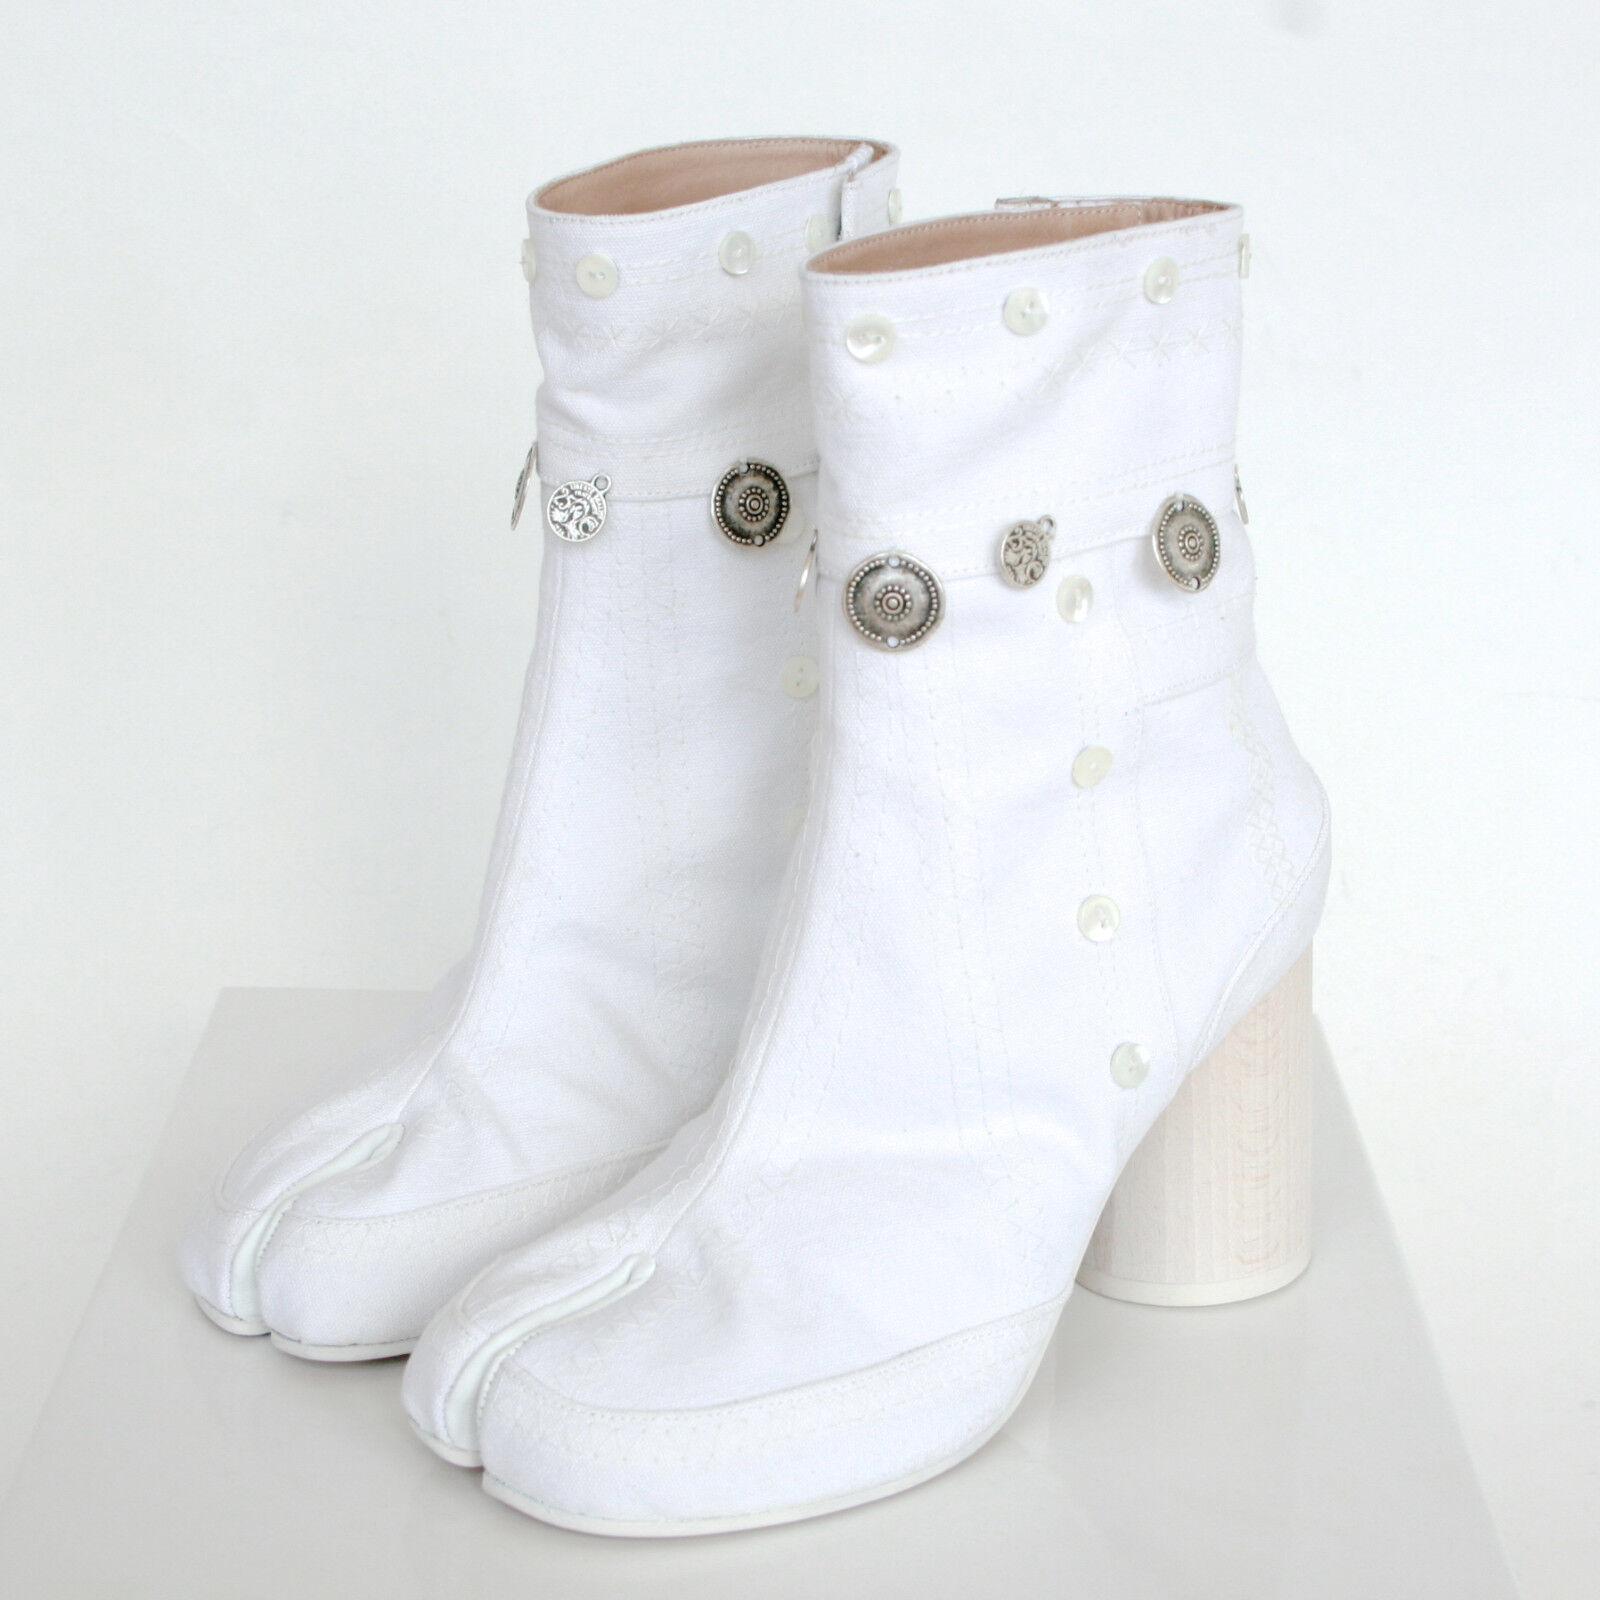 MAISON MARTIN MARGIELA split toe gypsy coin embroidered white tabi boots 37 NEW